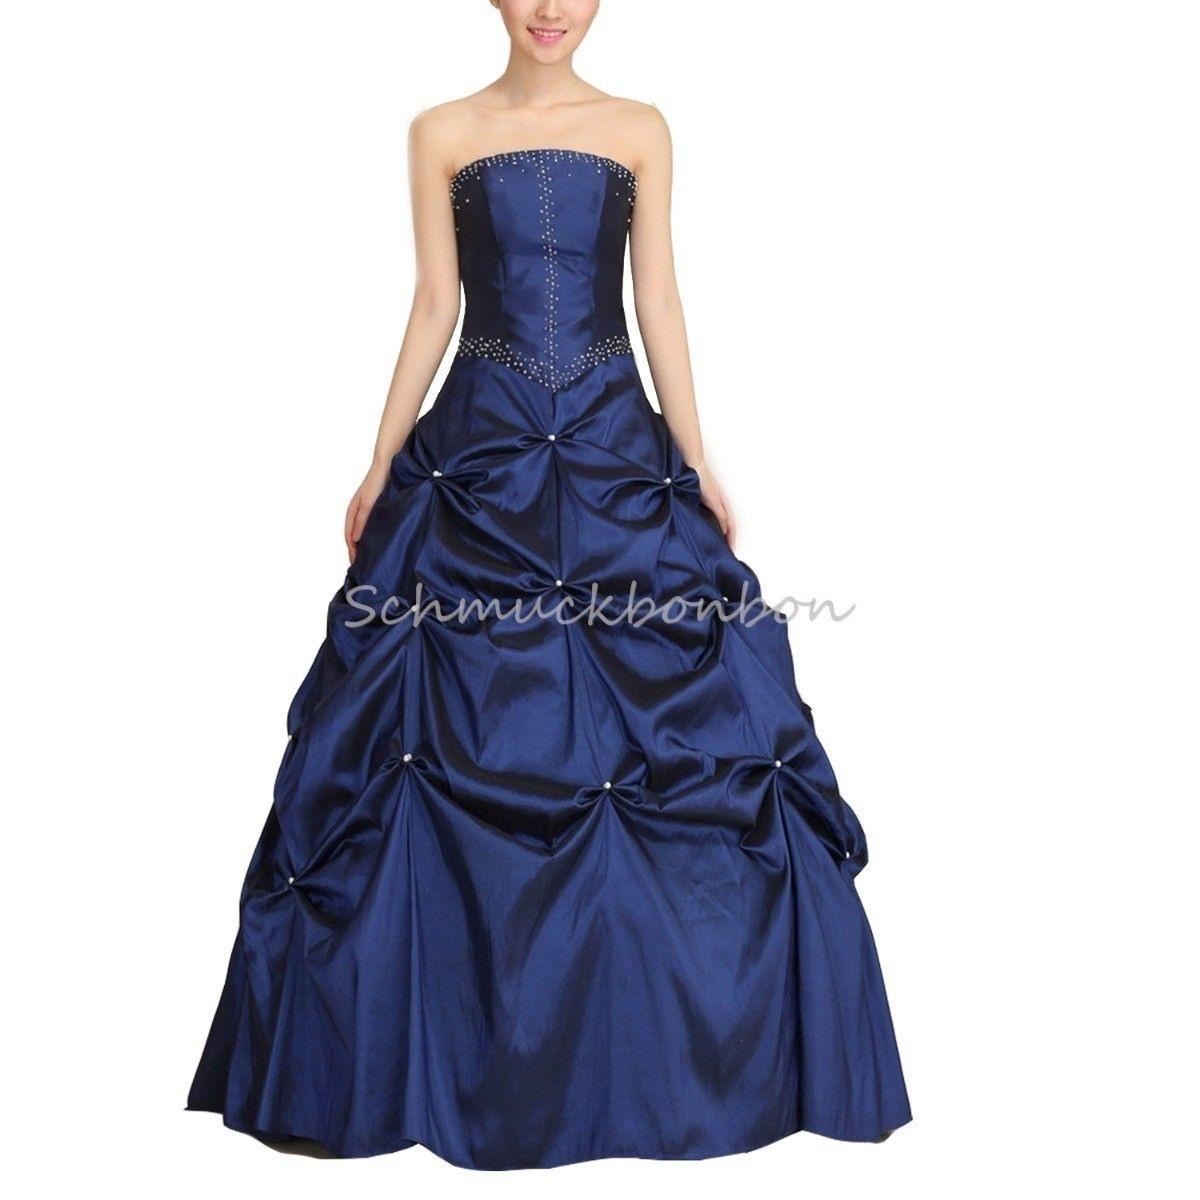 Perfekt Abendkleid 34 Lang Bester Preis15 Einzigartig Abendkleid 34 Lang Stylish